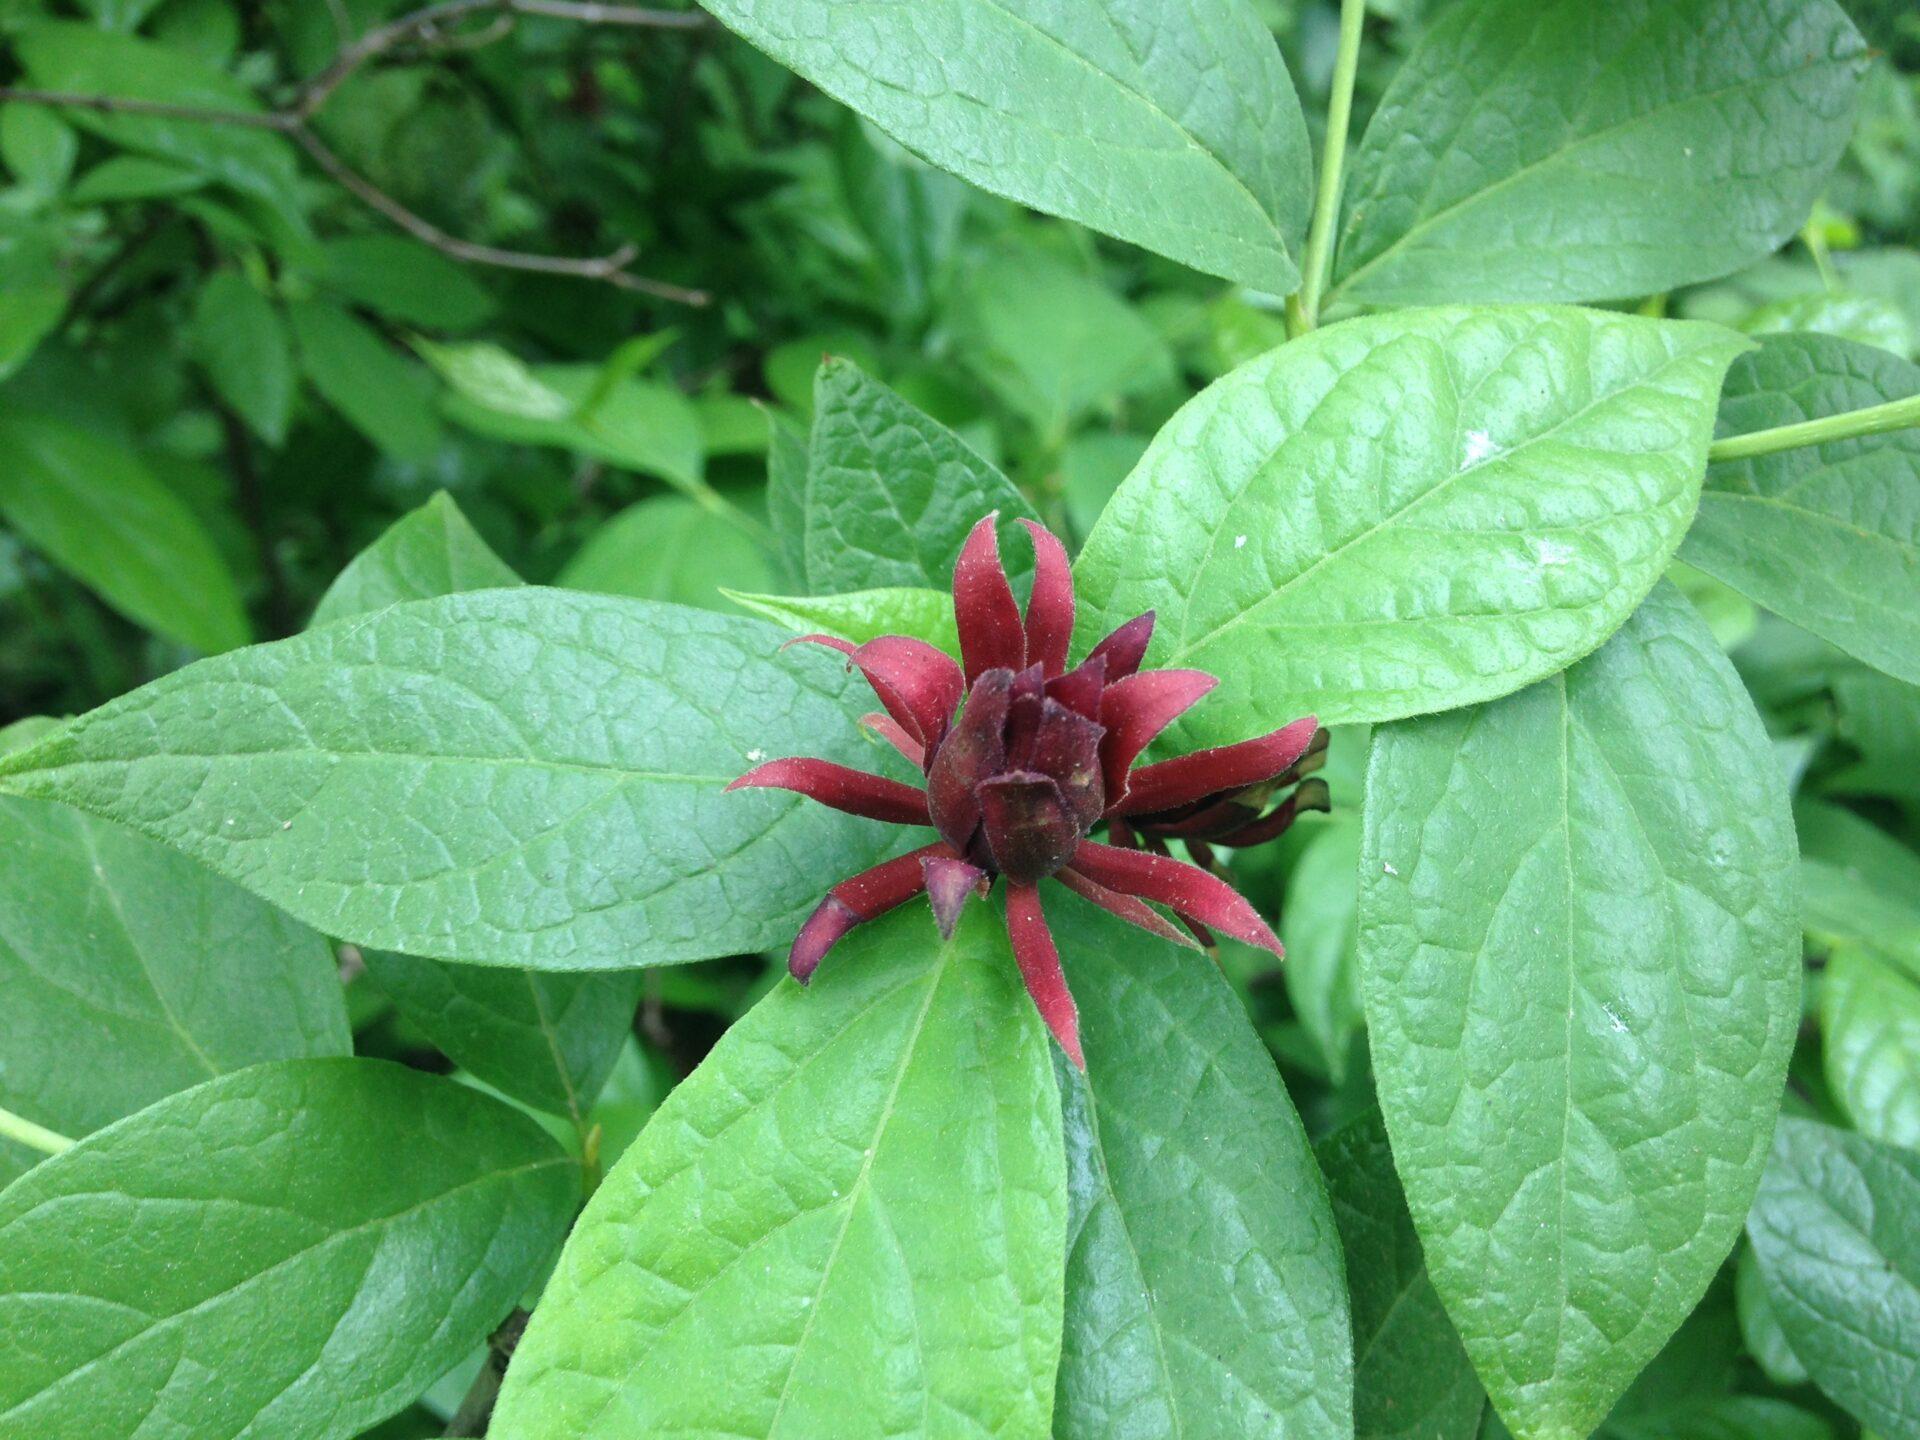 Sweetshrub Carolina Allspice Strawberry Bush Shrubs For Sale